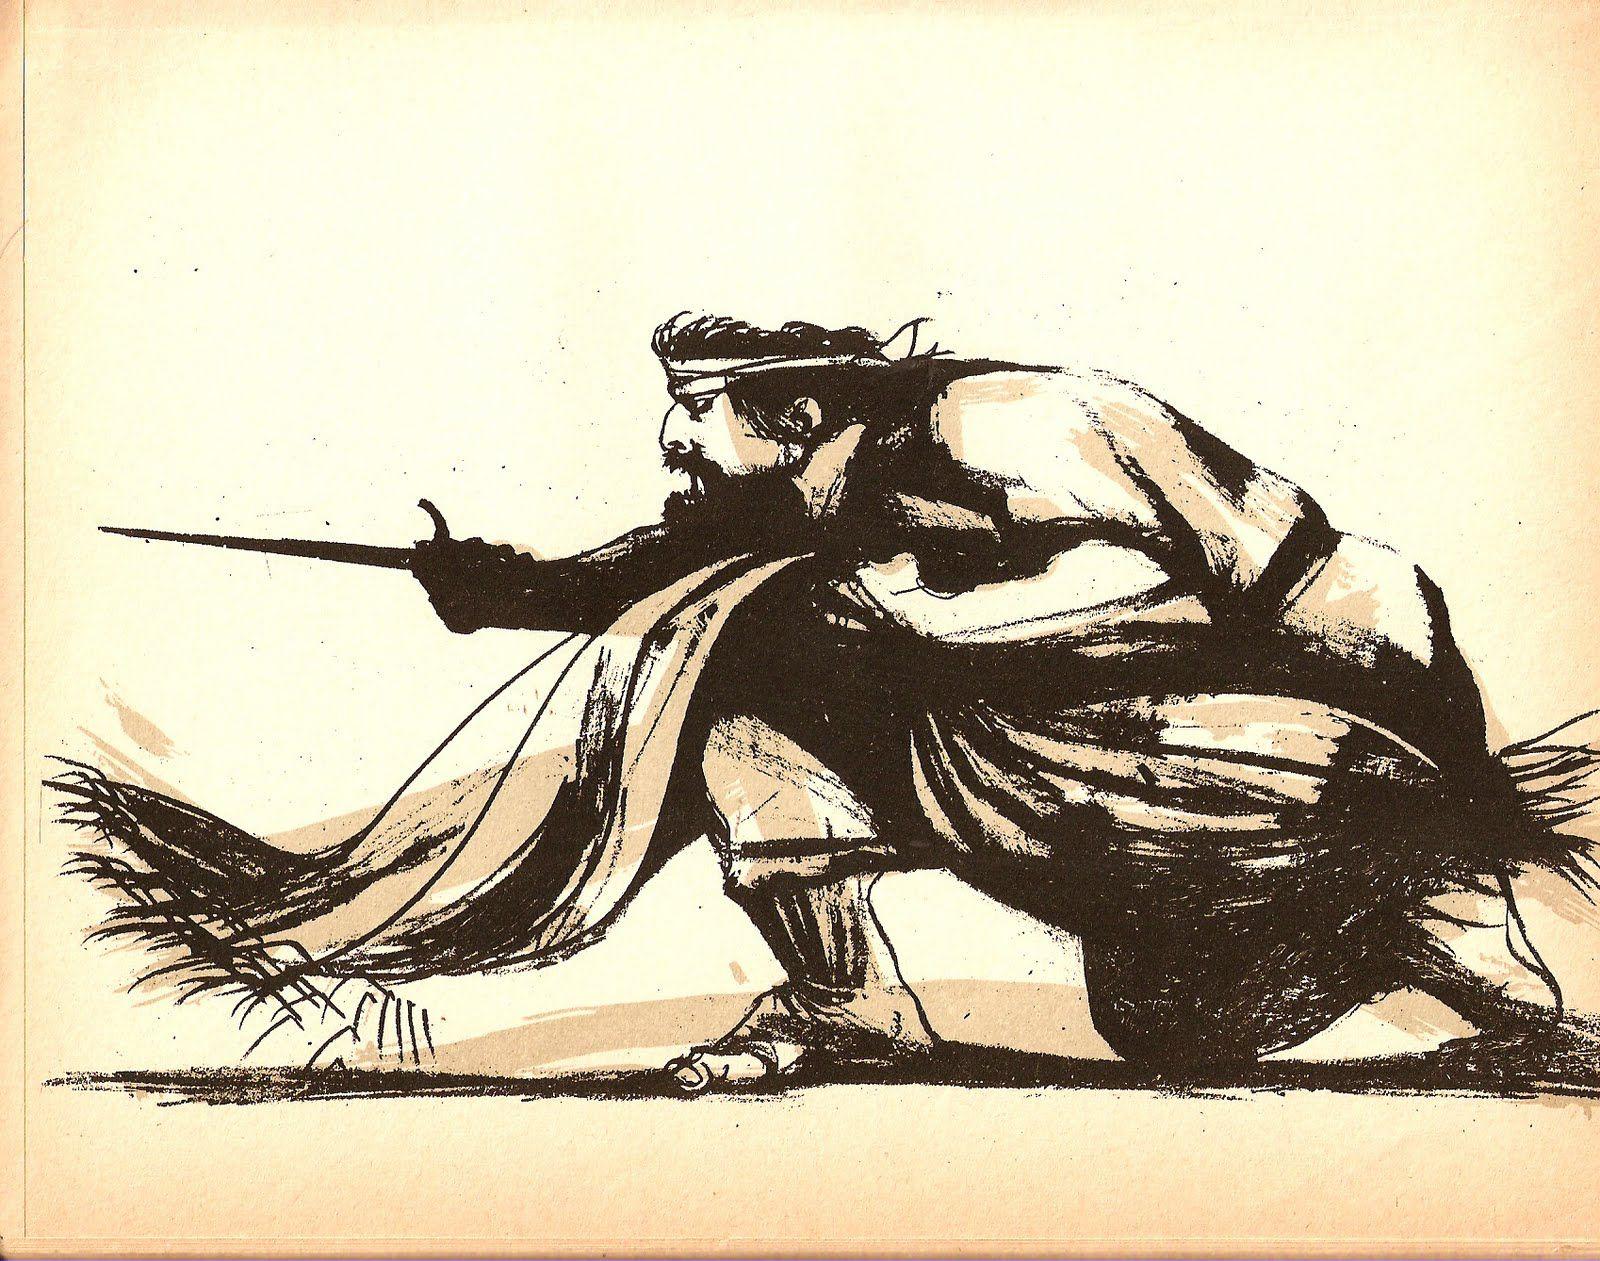 Carlos Alonso Dibujos De Campos Pinturas Frases De Caballos